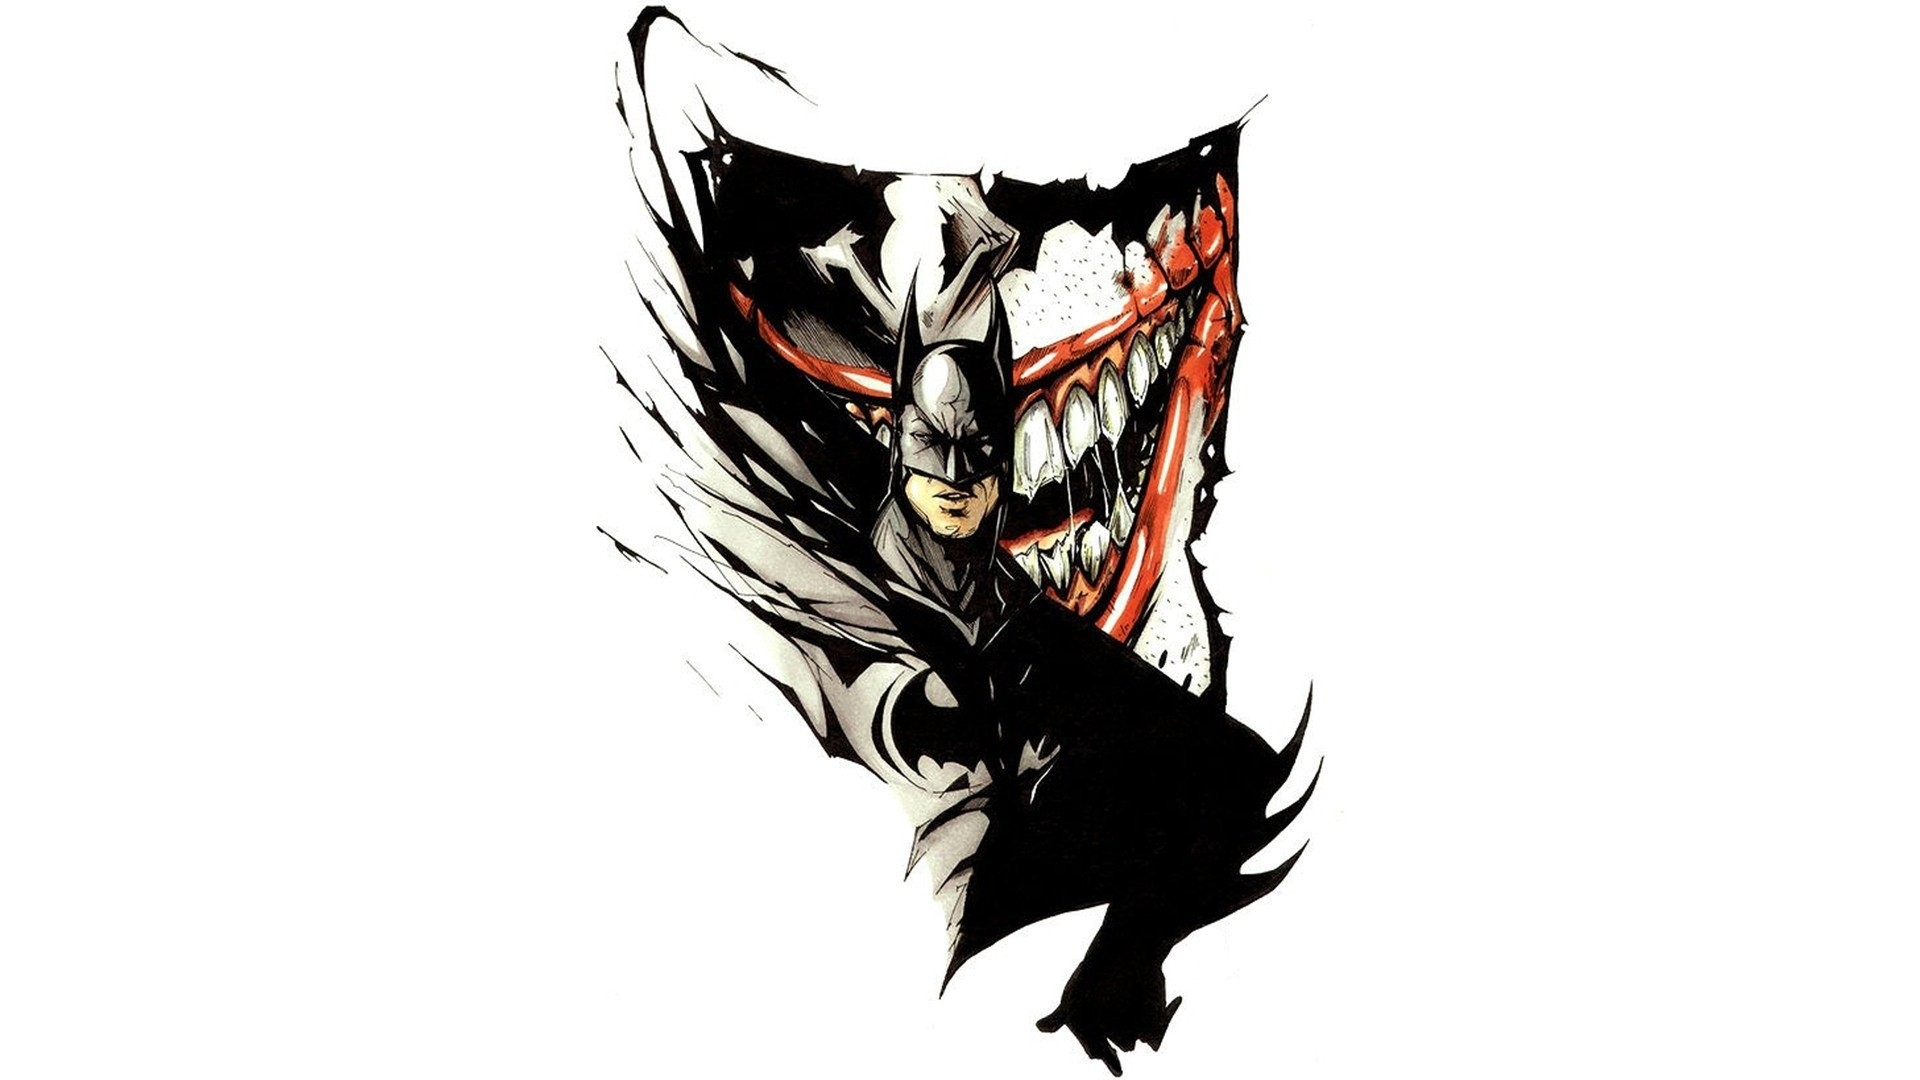 Joker HD Wallpapers Wallpaper × Wallpaper Joker